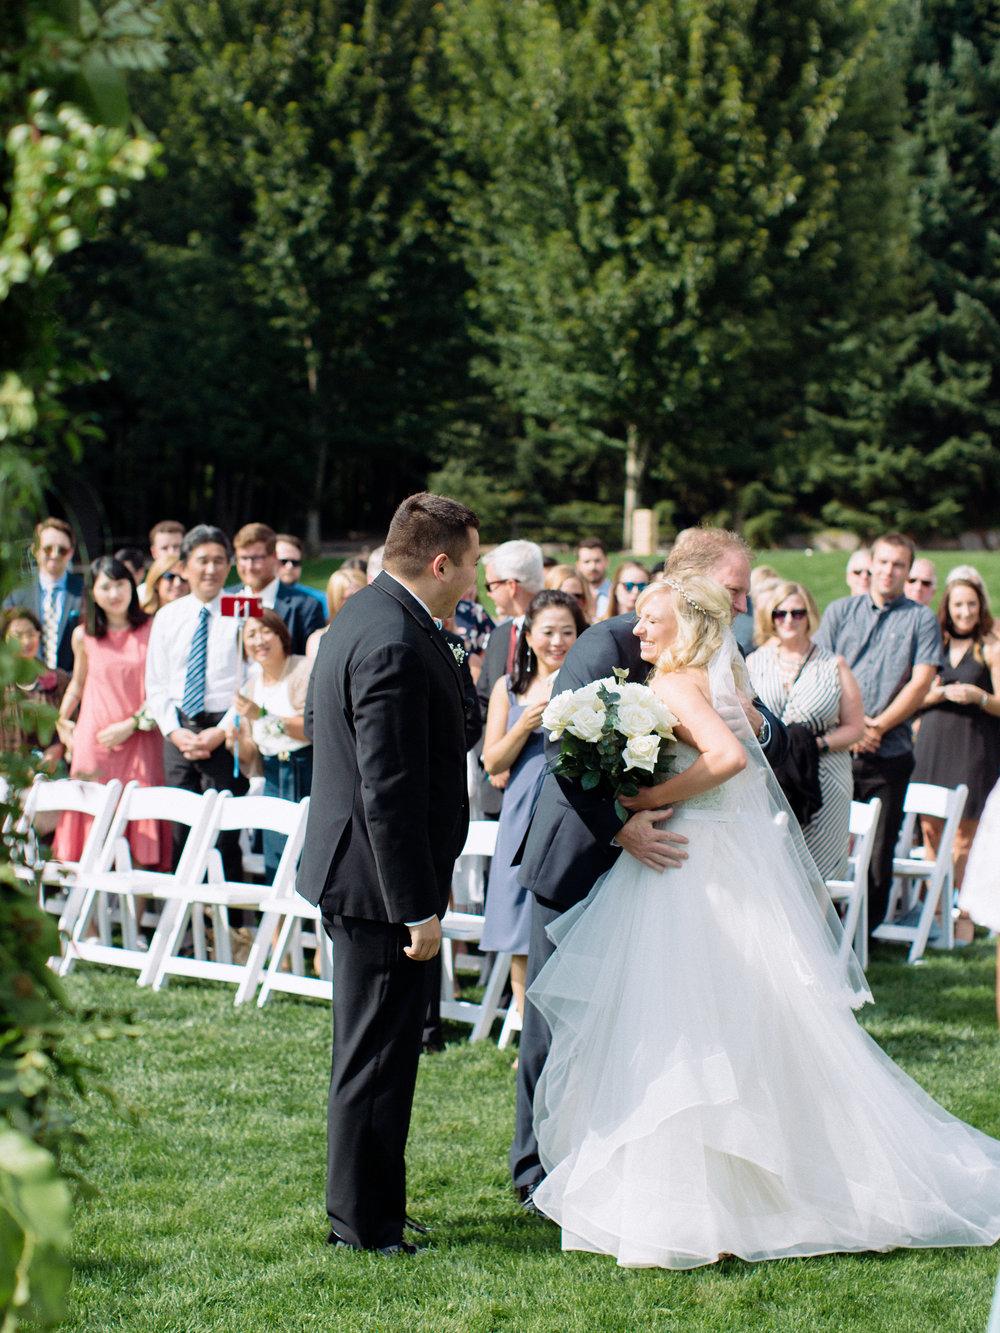 Kristina-Tyler-Wedding-Ceremony-106.jpg